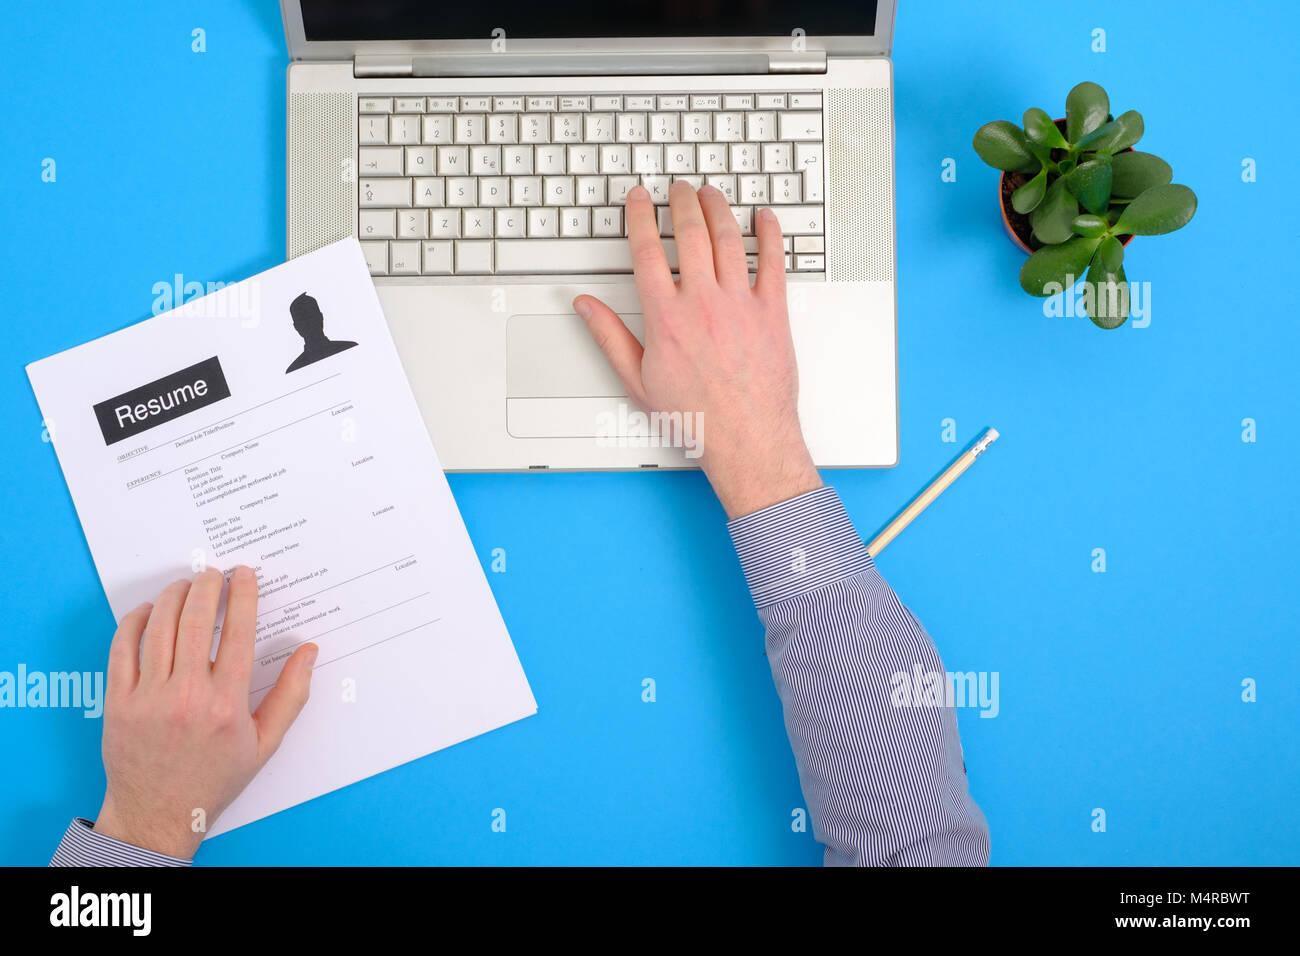 Work Application Imágenes De Stock & Work Application Fotos De Stock ...